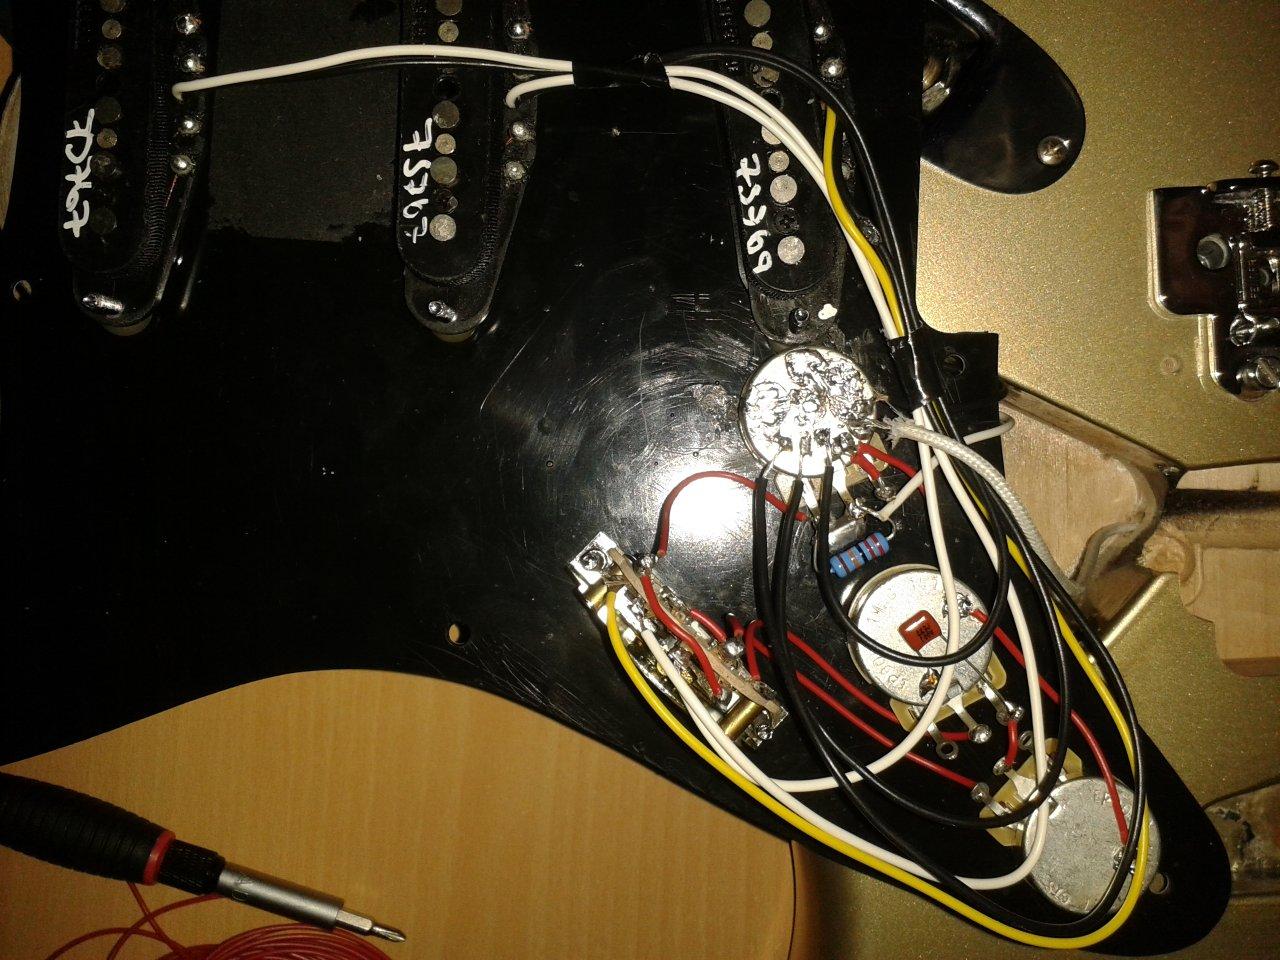 E Gitarre Brummt Nach Einbau Von Fender Vintage Noiseless Pickups Noise Less Wiring Diagram Gru Flo 20160102 1742011